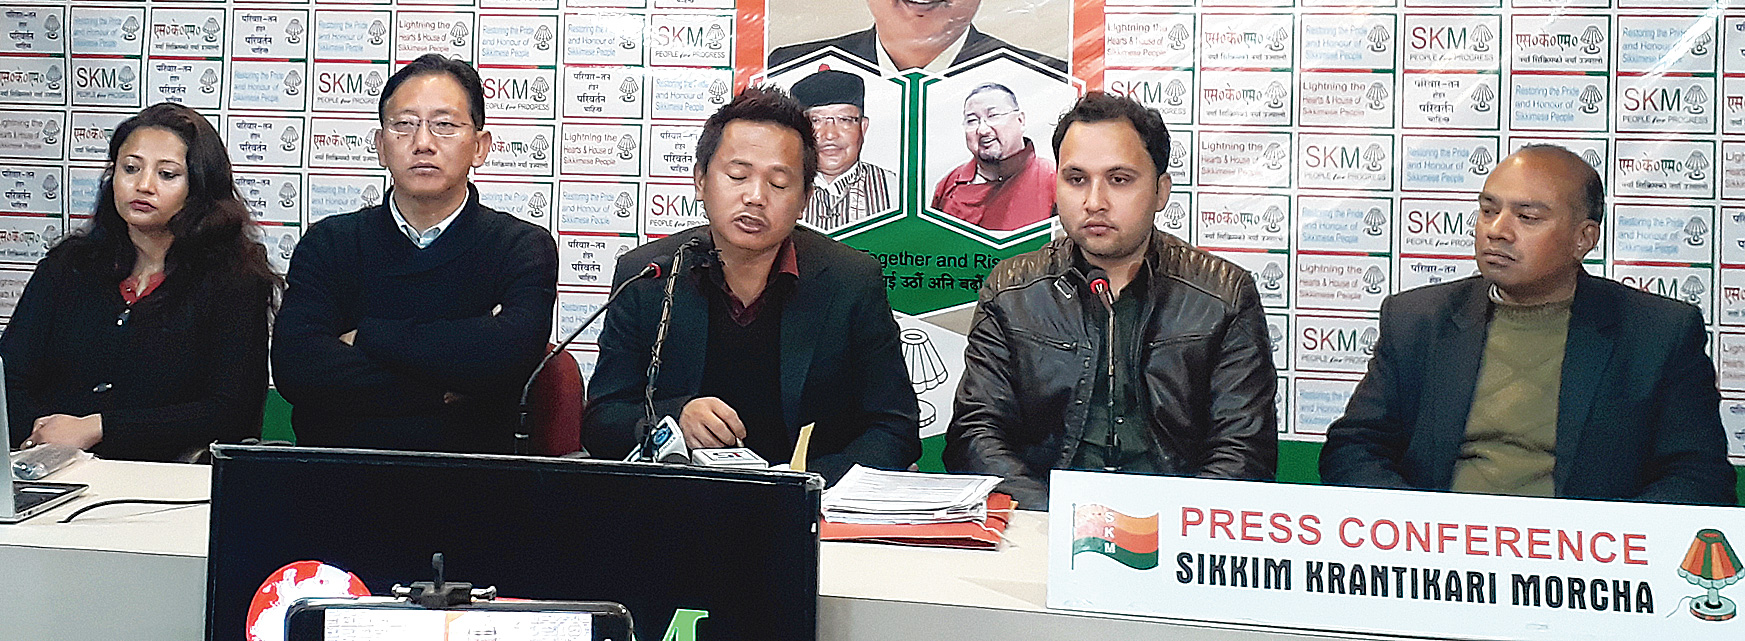 SKM leaders address the media in Gangtok on Tuesday.